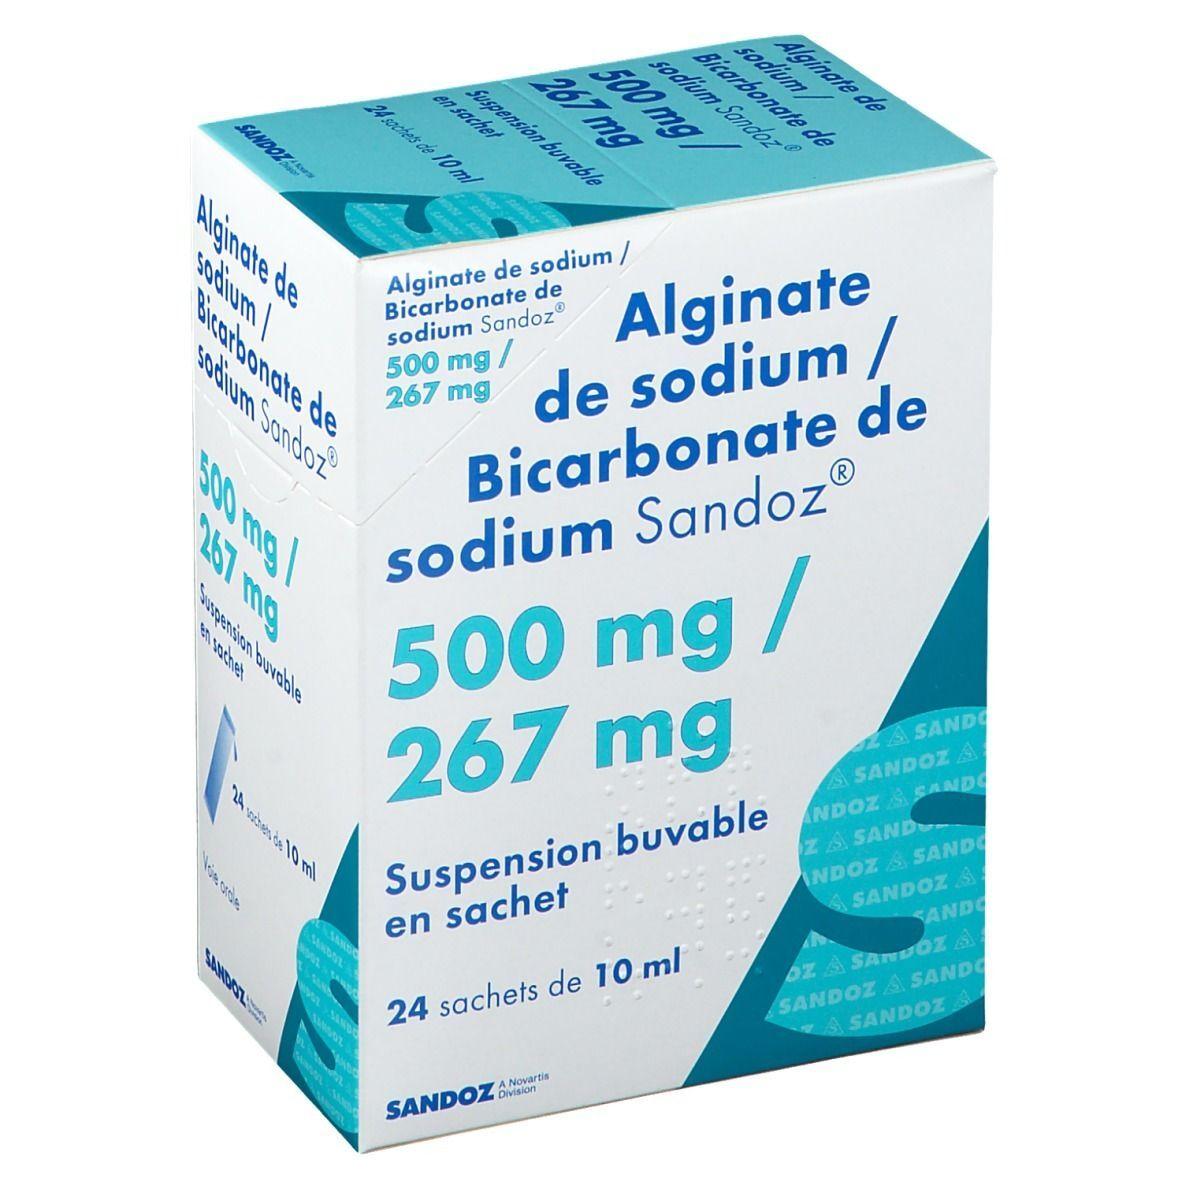 Sandoz® Alginate de sodium / Bicarbonate de sodium Sandoz® pc(s) suspension(s) buvable(s)